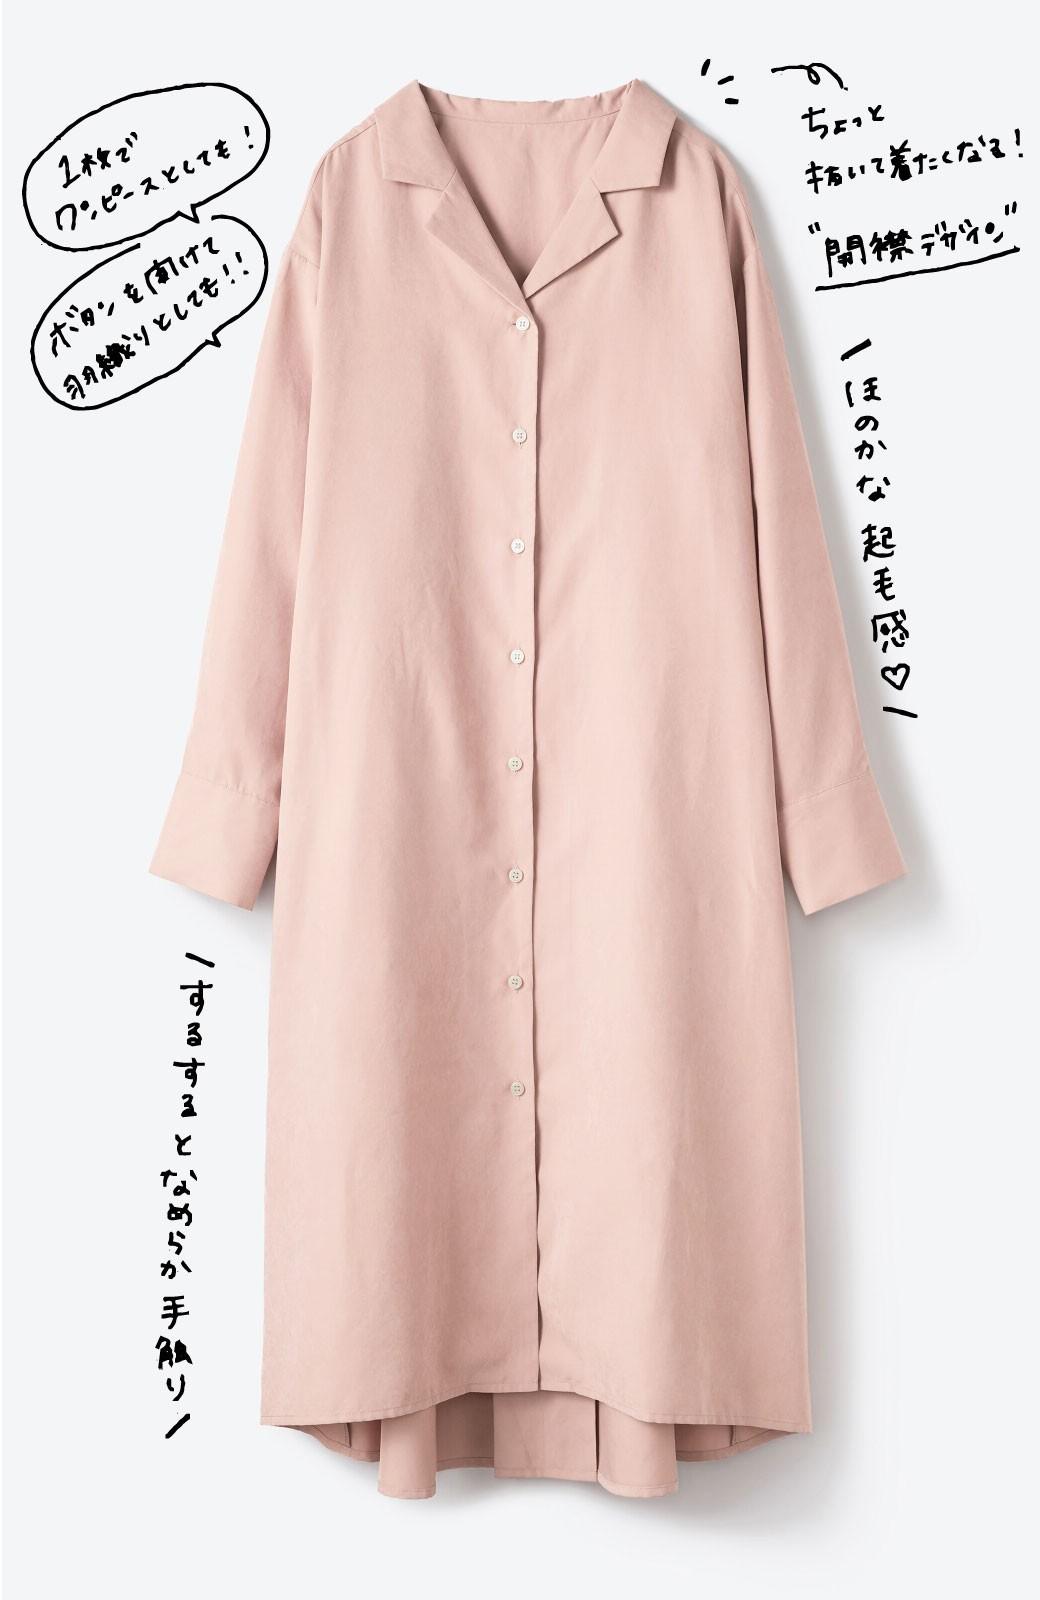 haco! 太ってもばれずに羽織っても便利なAラインワンピース <ピンク>の商品写真1